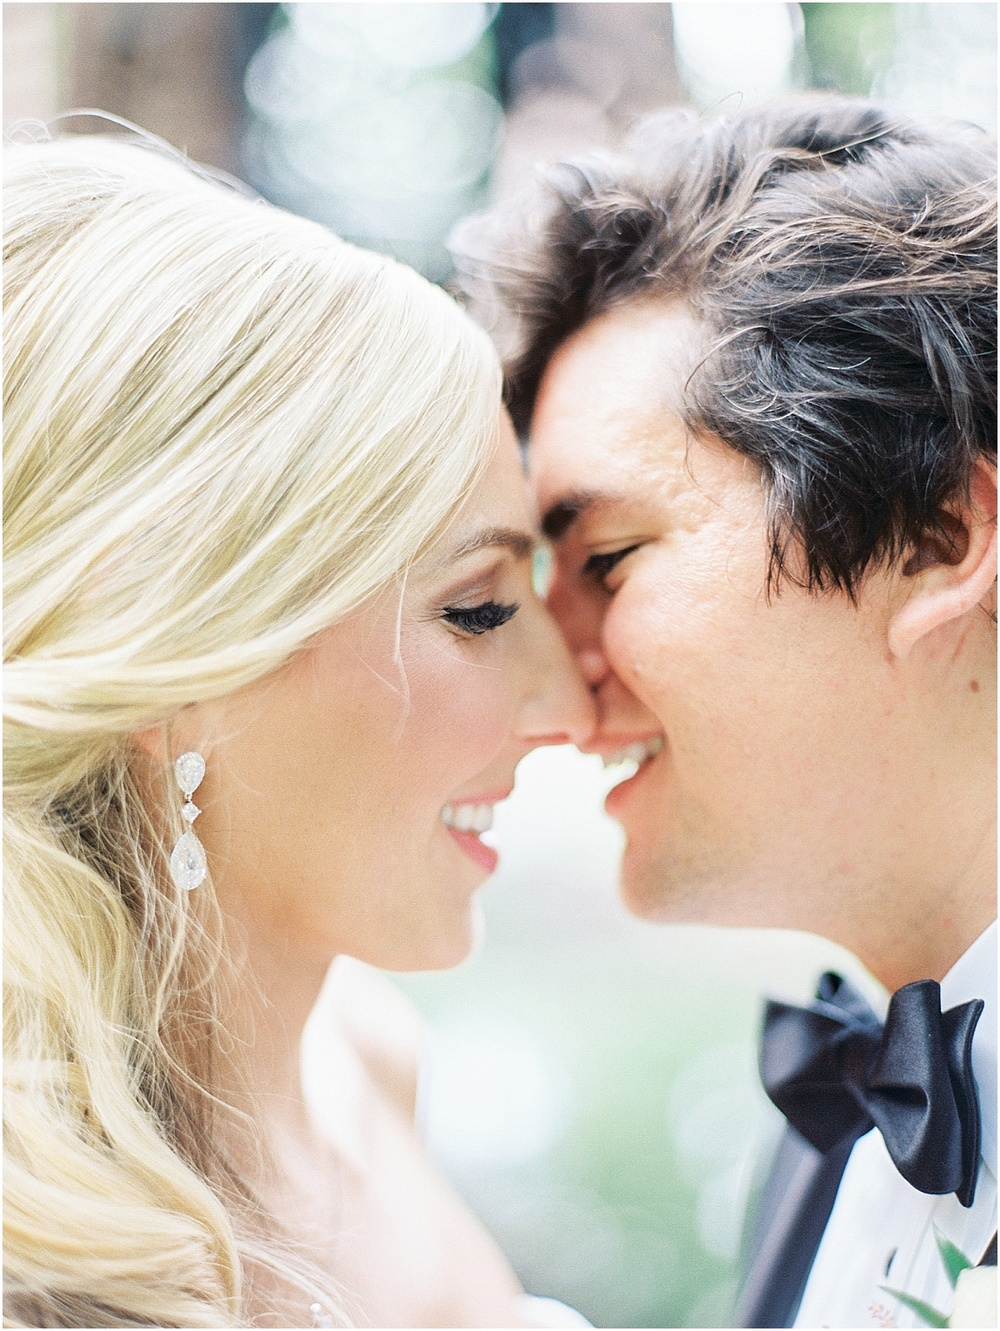 St_Louis_Wedding_Fine_Art_Film_Photographer_Jordan_Brittley_(www.jordanbrittley.com)_0031.jpg